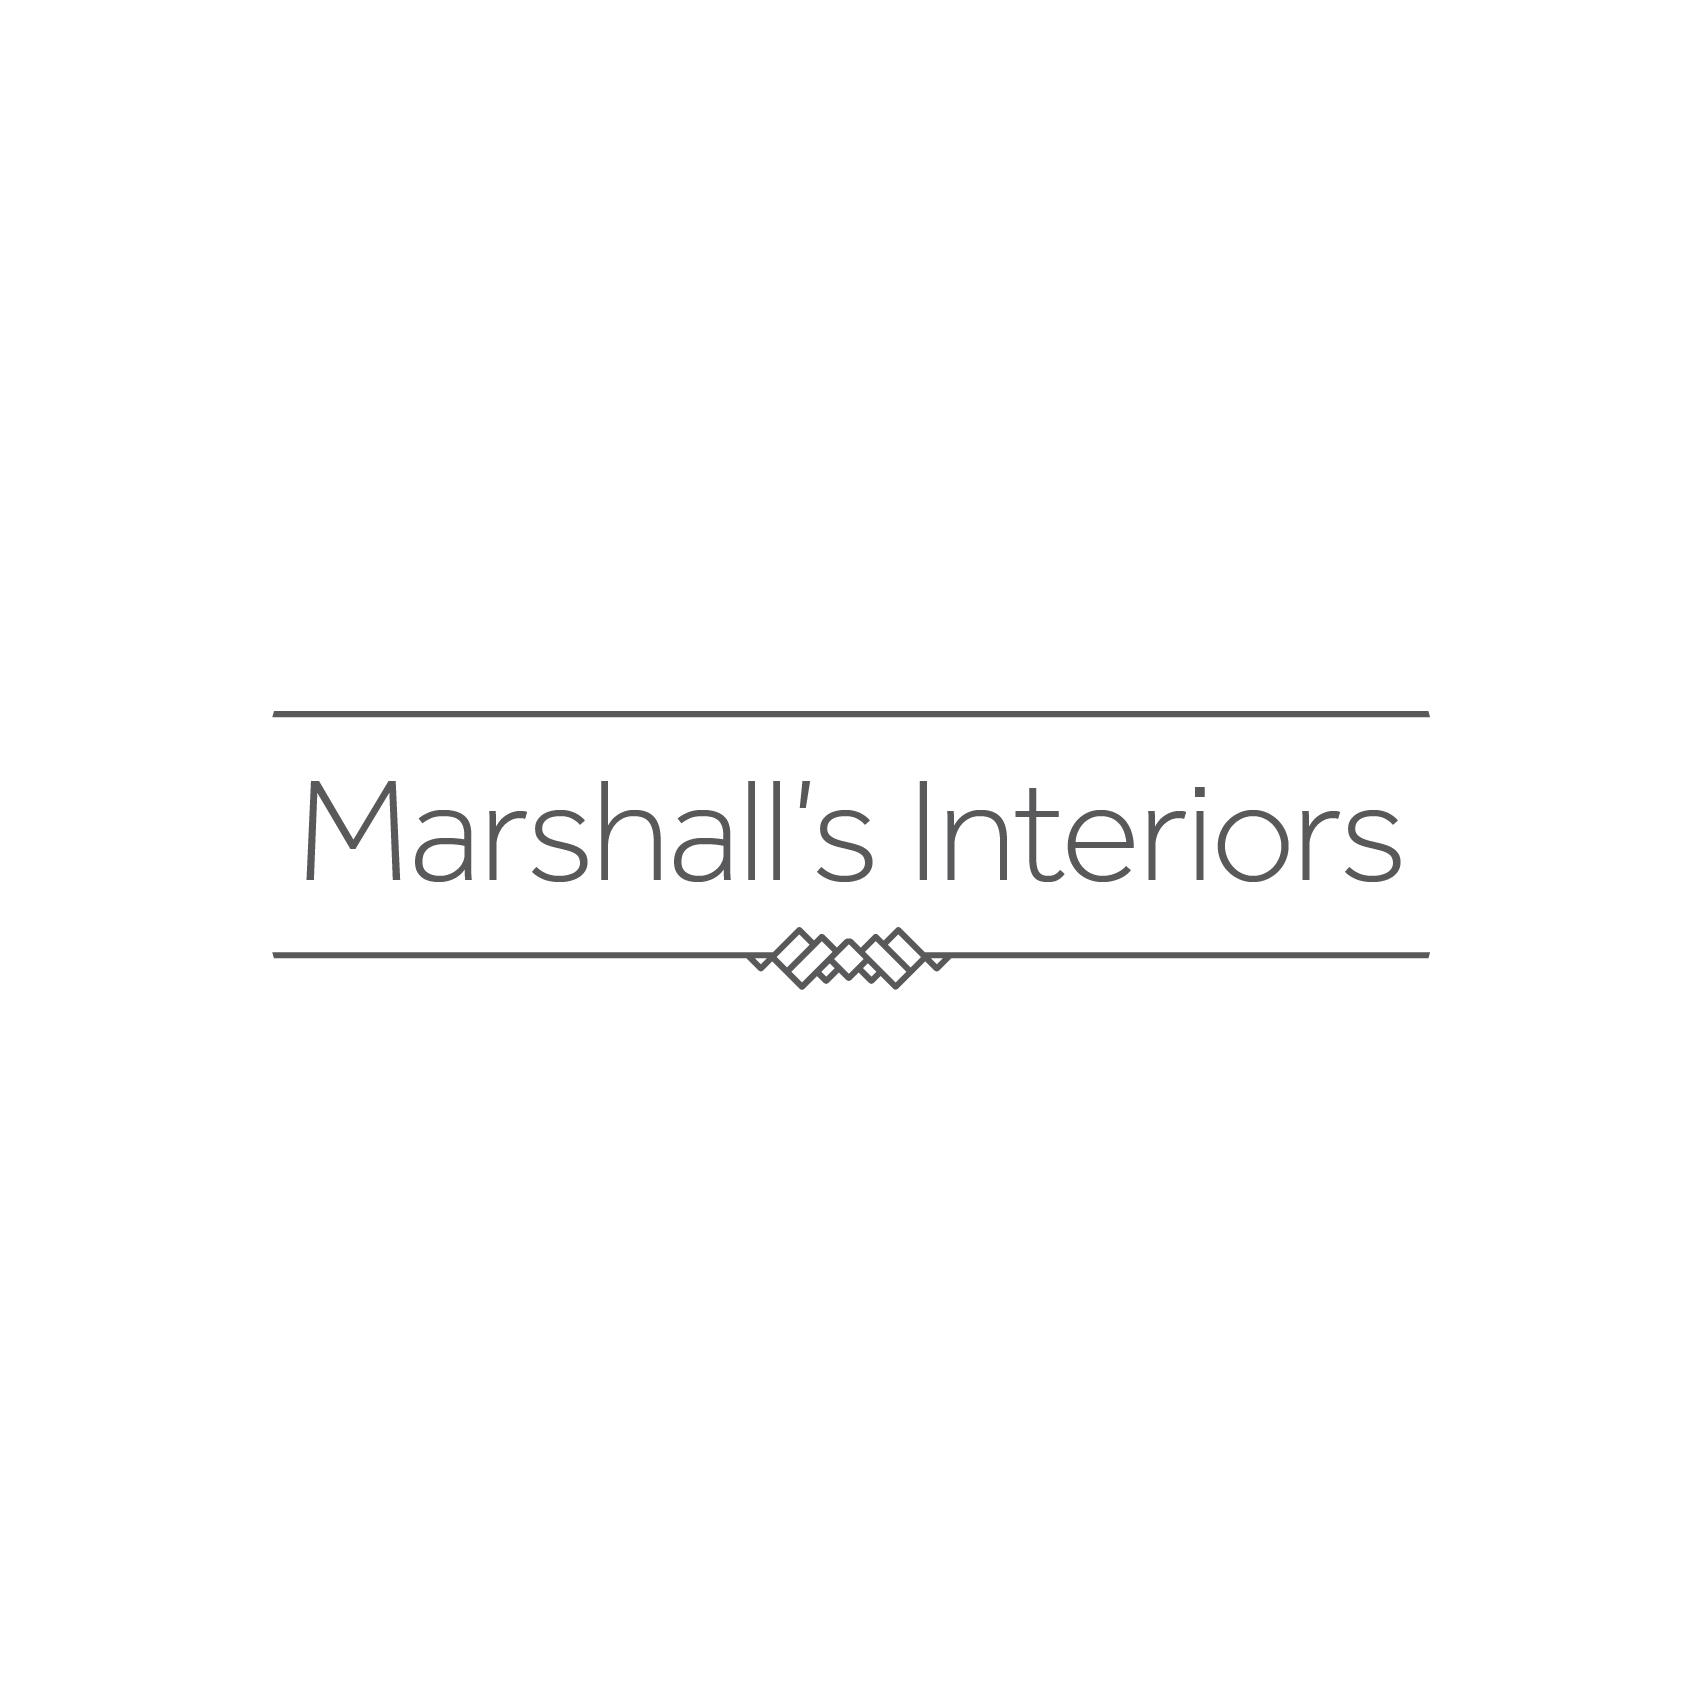 Marshall's Interiors Logo